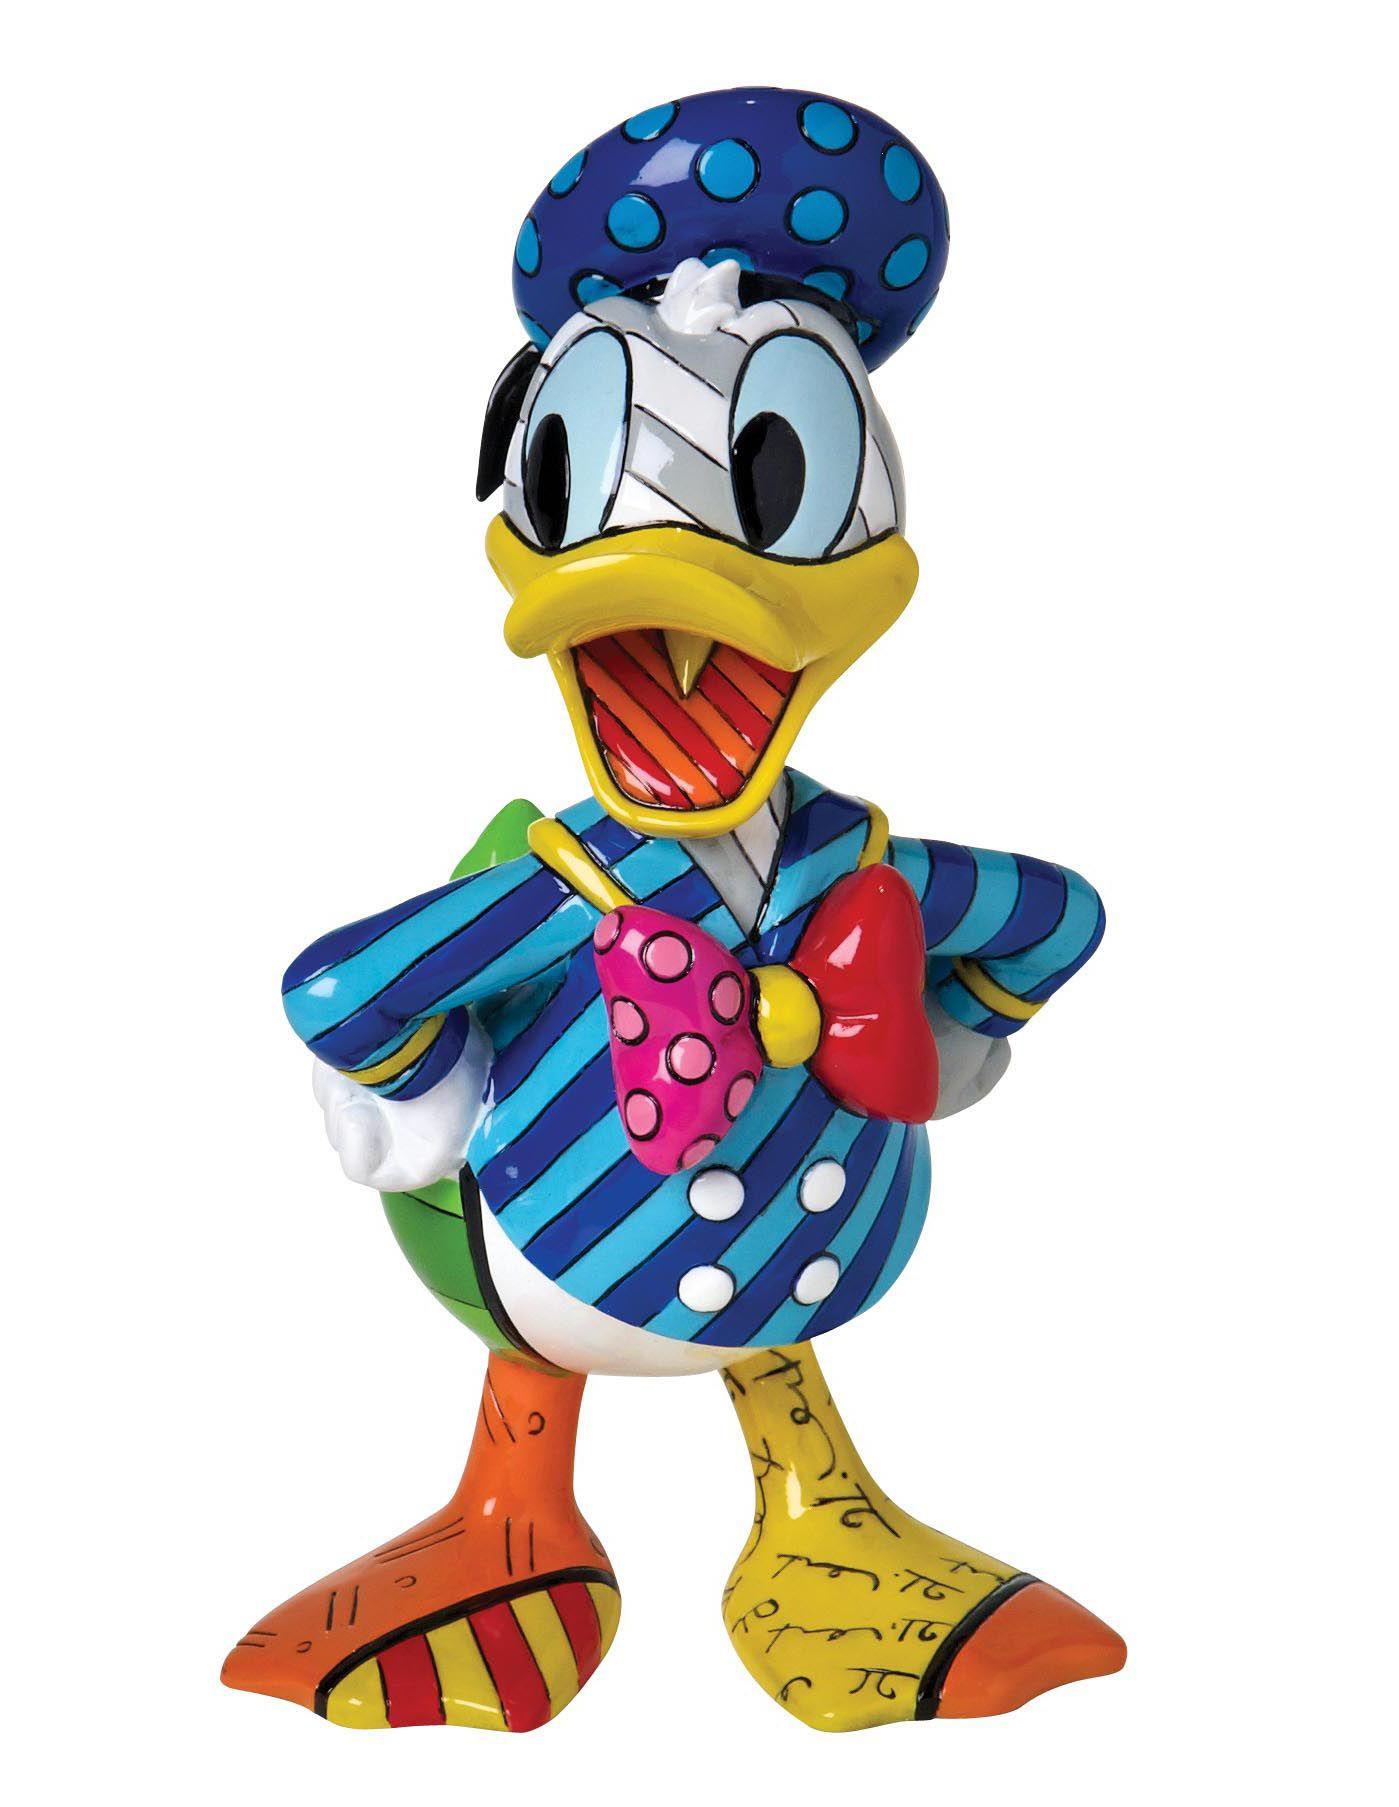 DISNEY BY BRITTO Disney by Britto Figur PopArt, »Donald Duck«